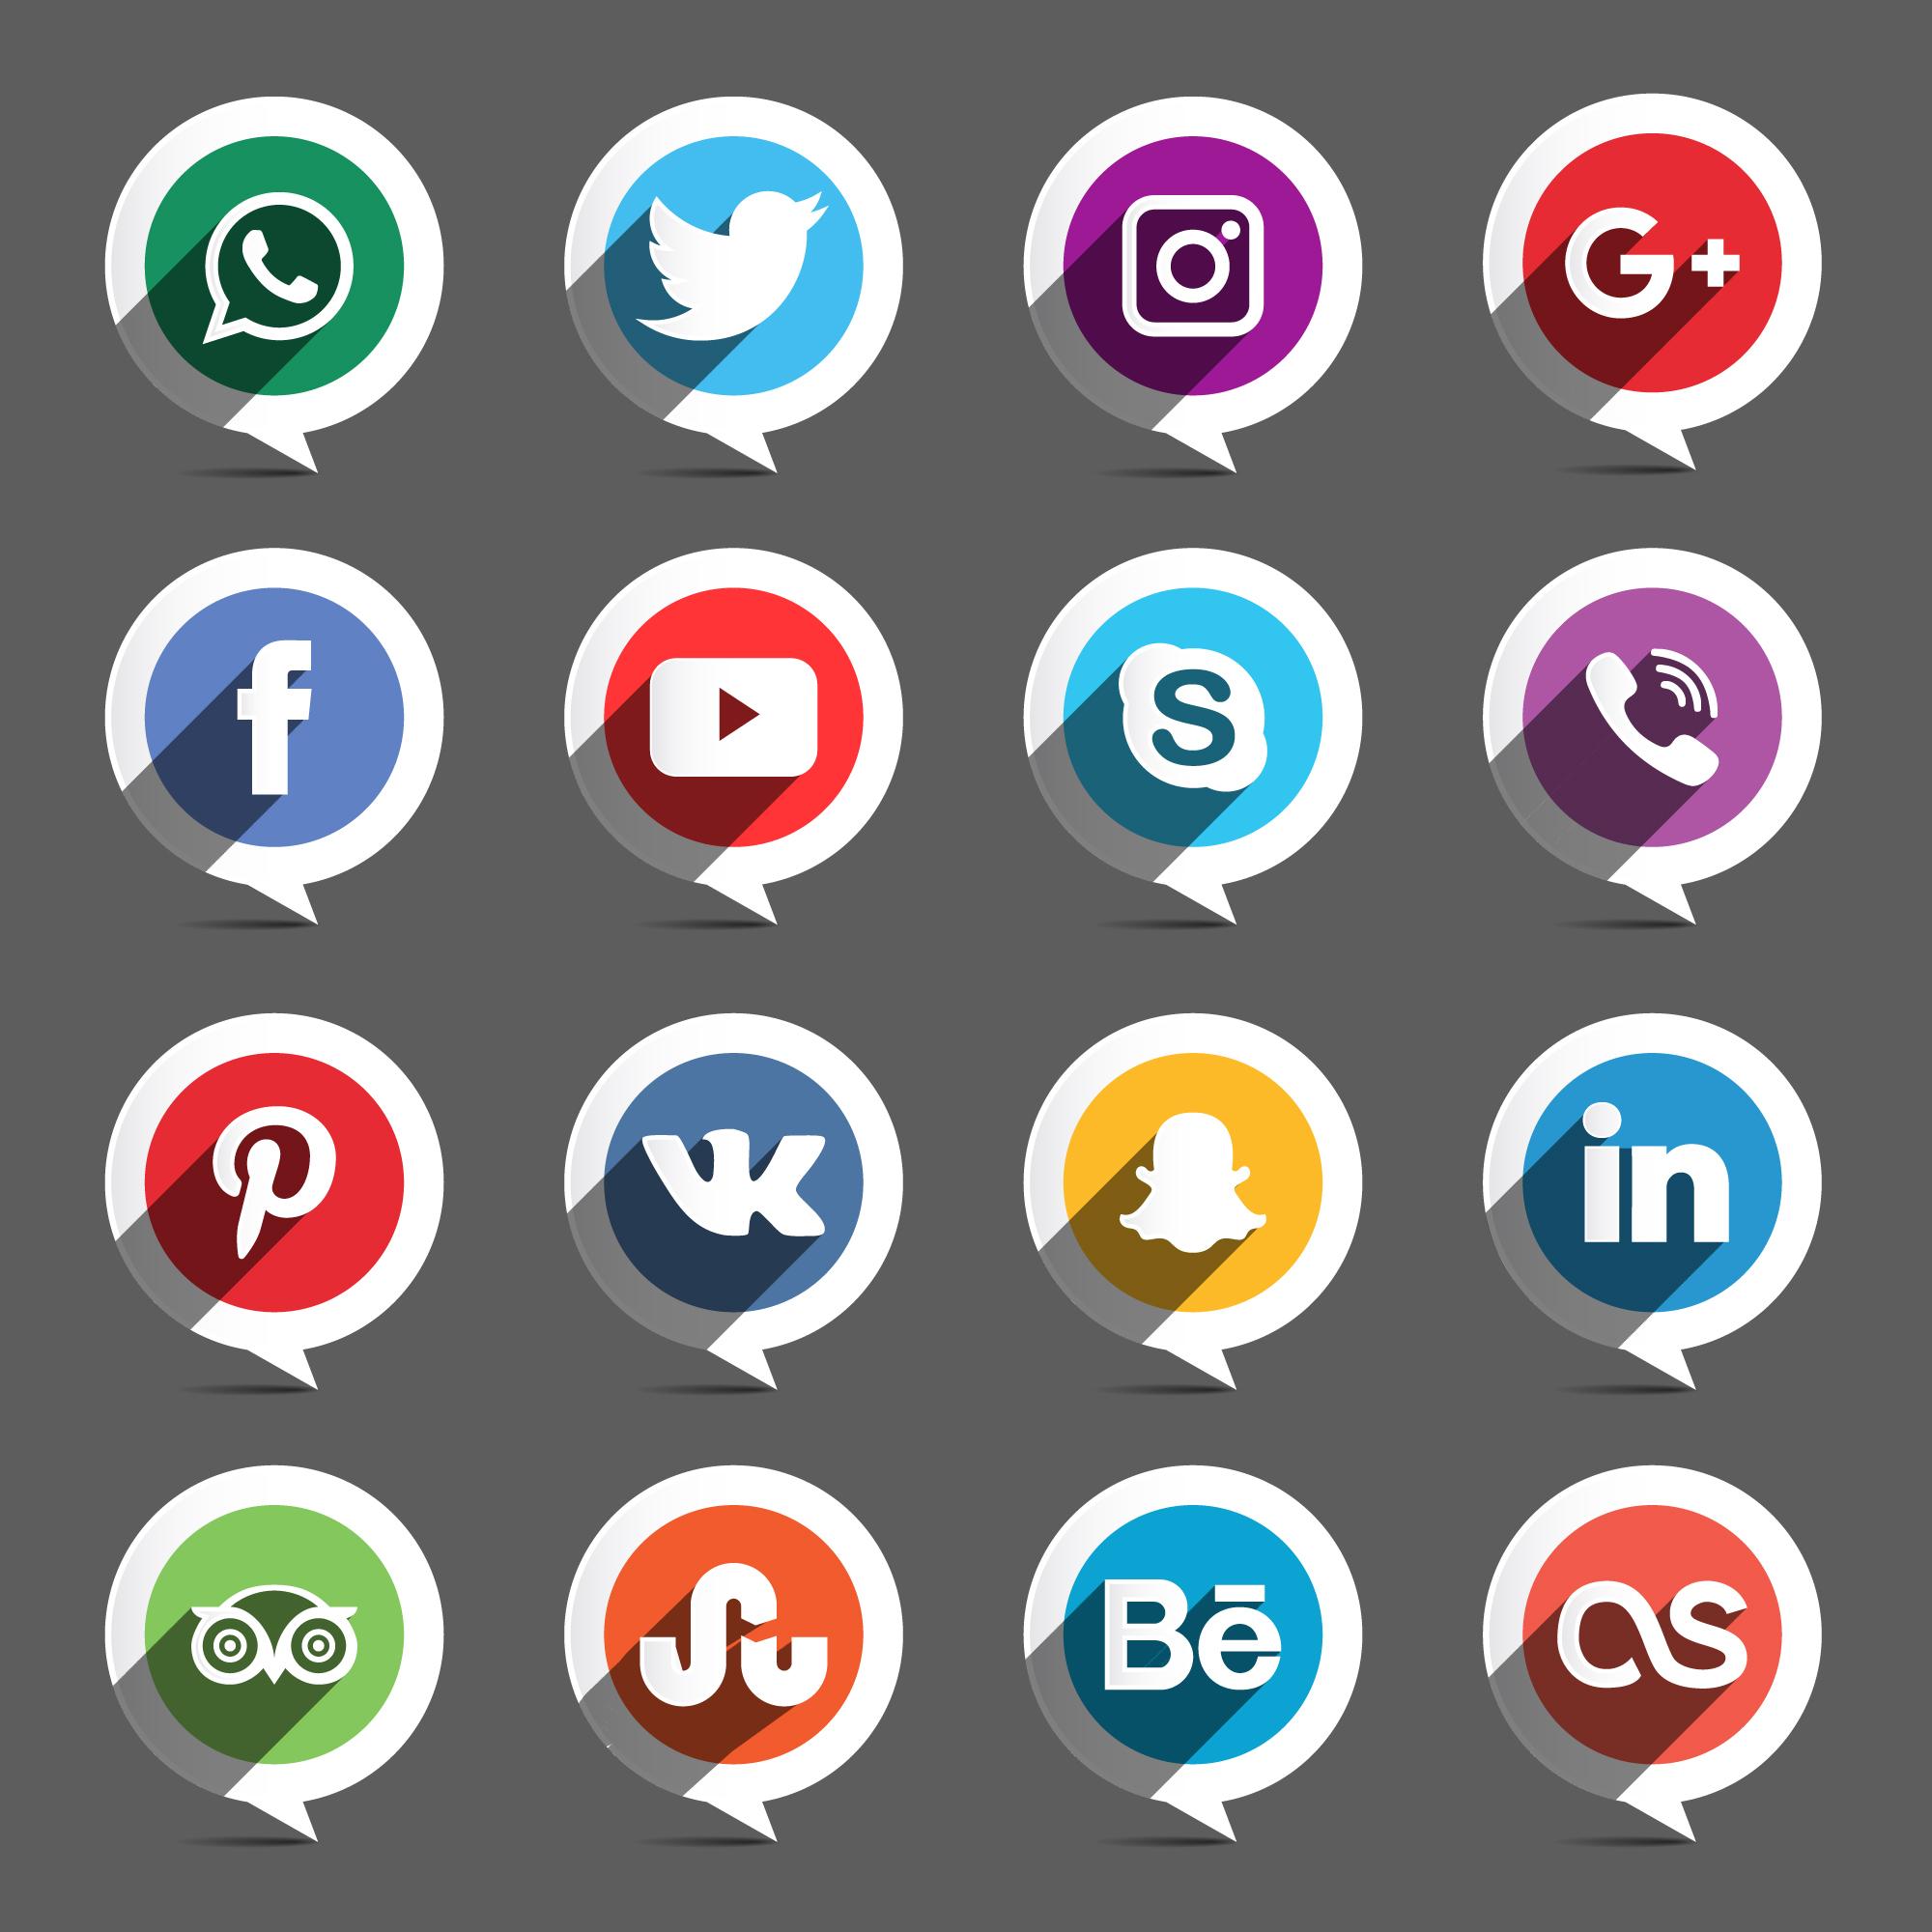 led sign social network - HD2000×2000